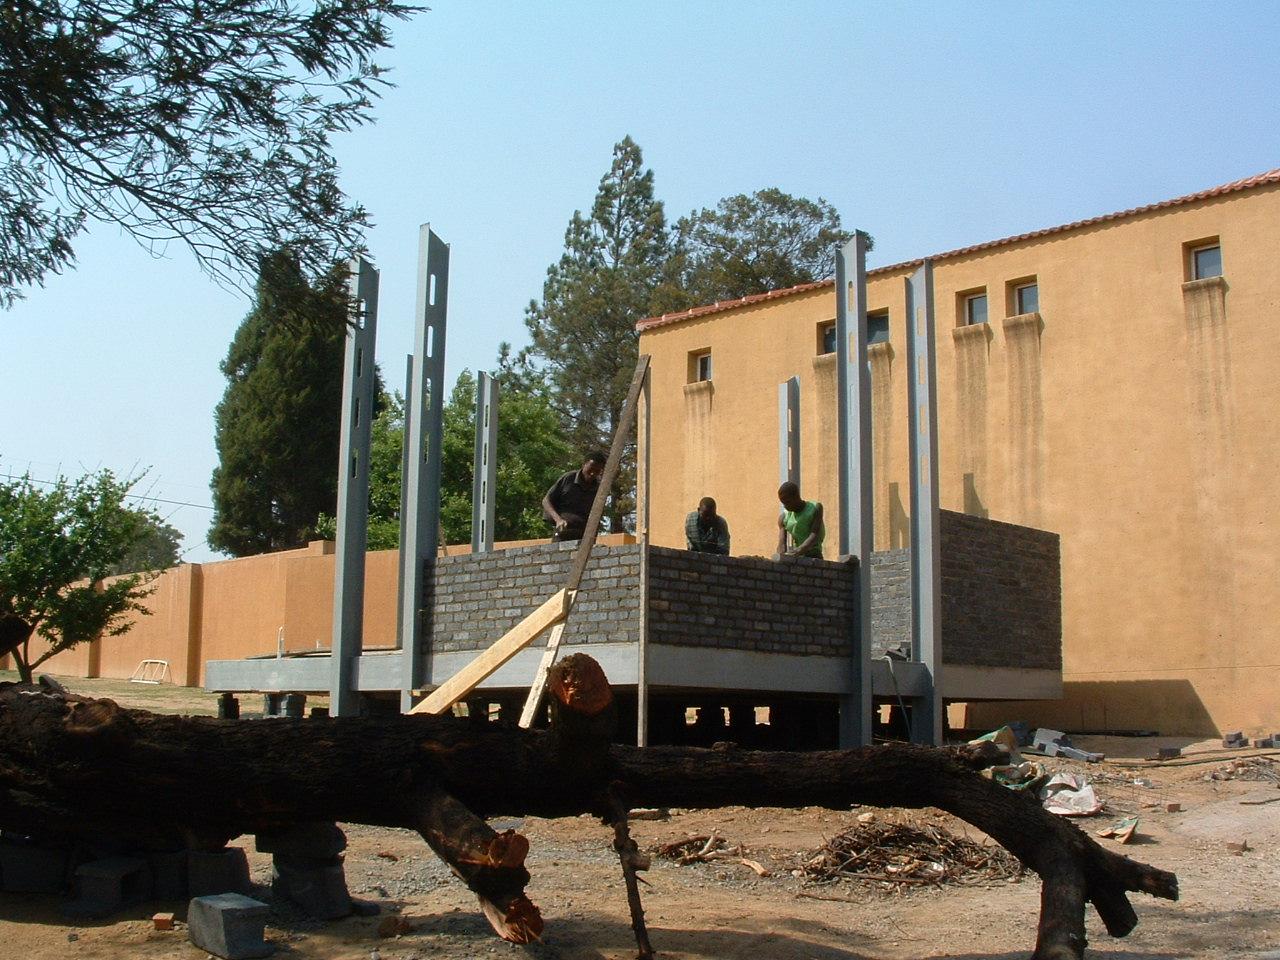 Hansgrohe - Construction